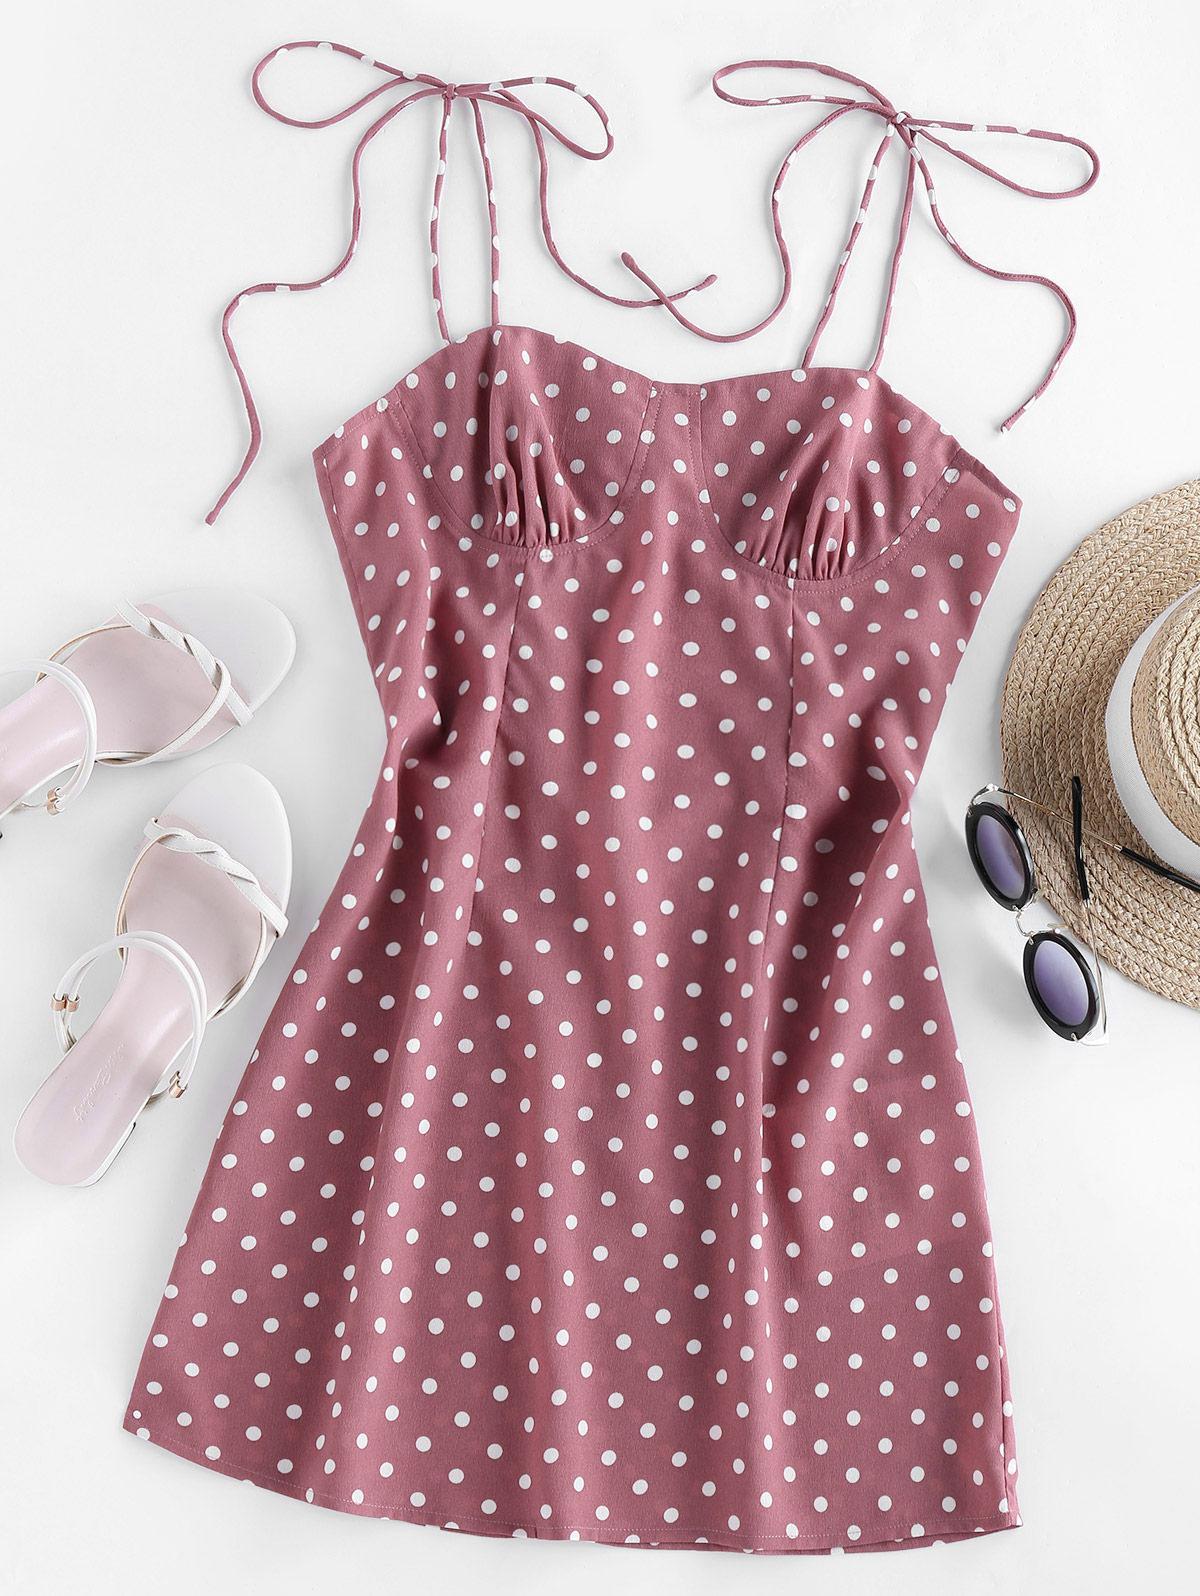 ZAFUL Polka Dot Tie Shoulder Cupped Dress